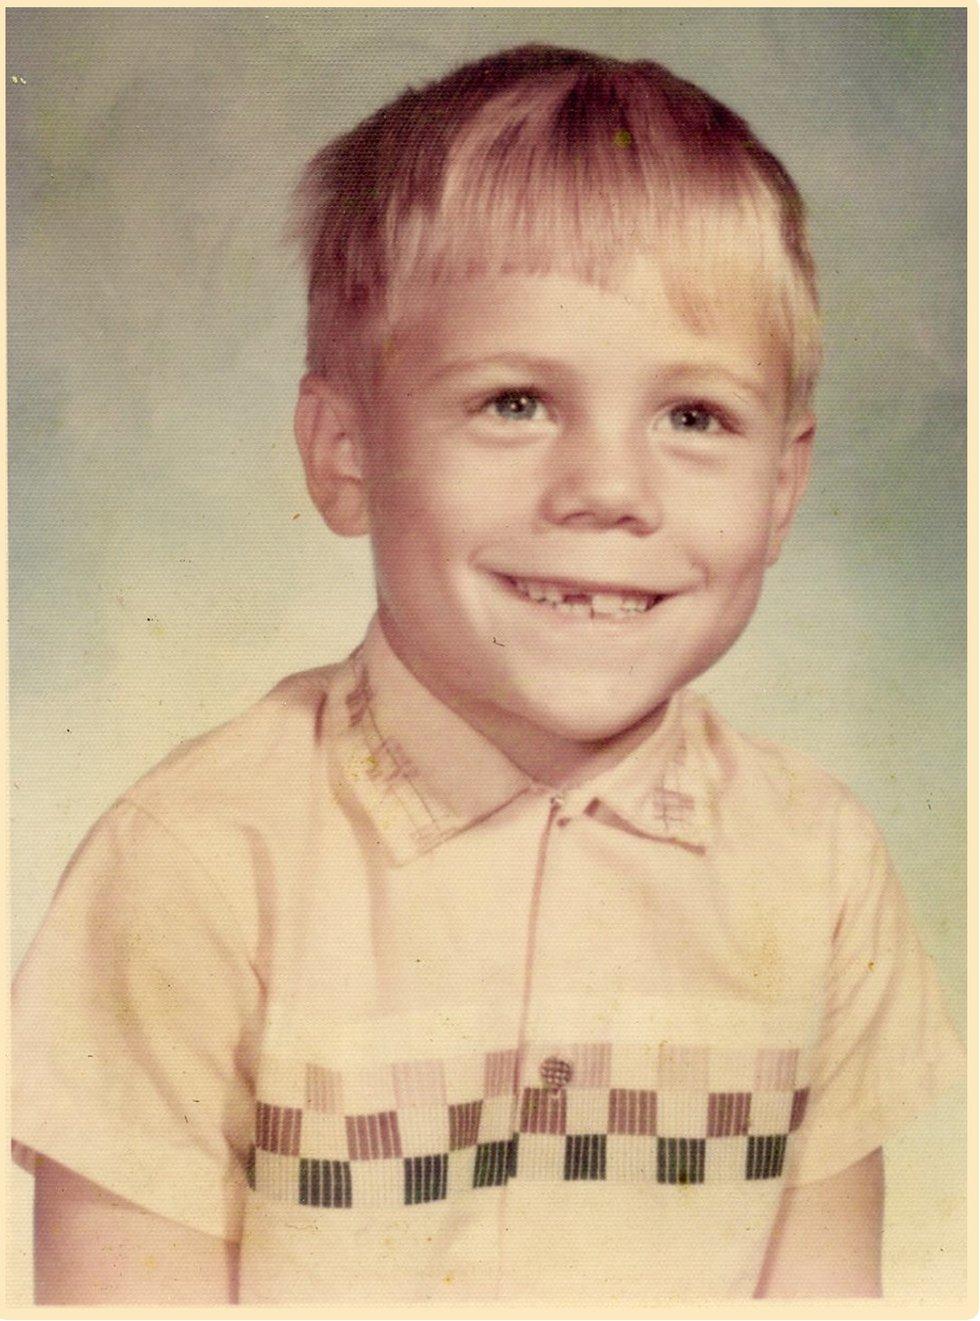 Al Conklin as a second grade student in 1971